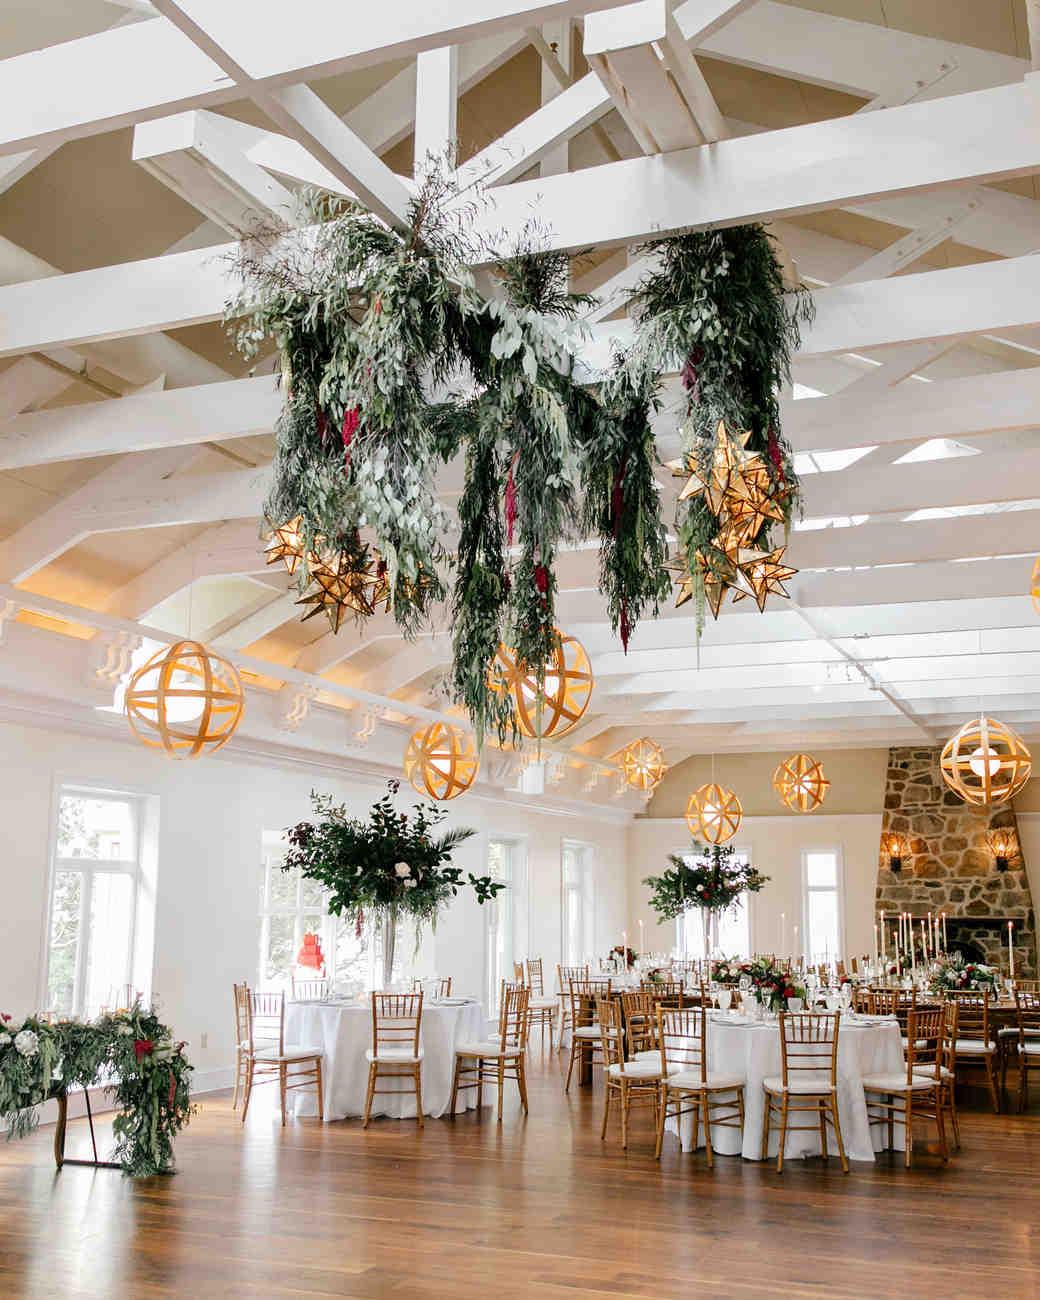 susan-tom-wedding-reception-236-s112692-0316.jpg